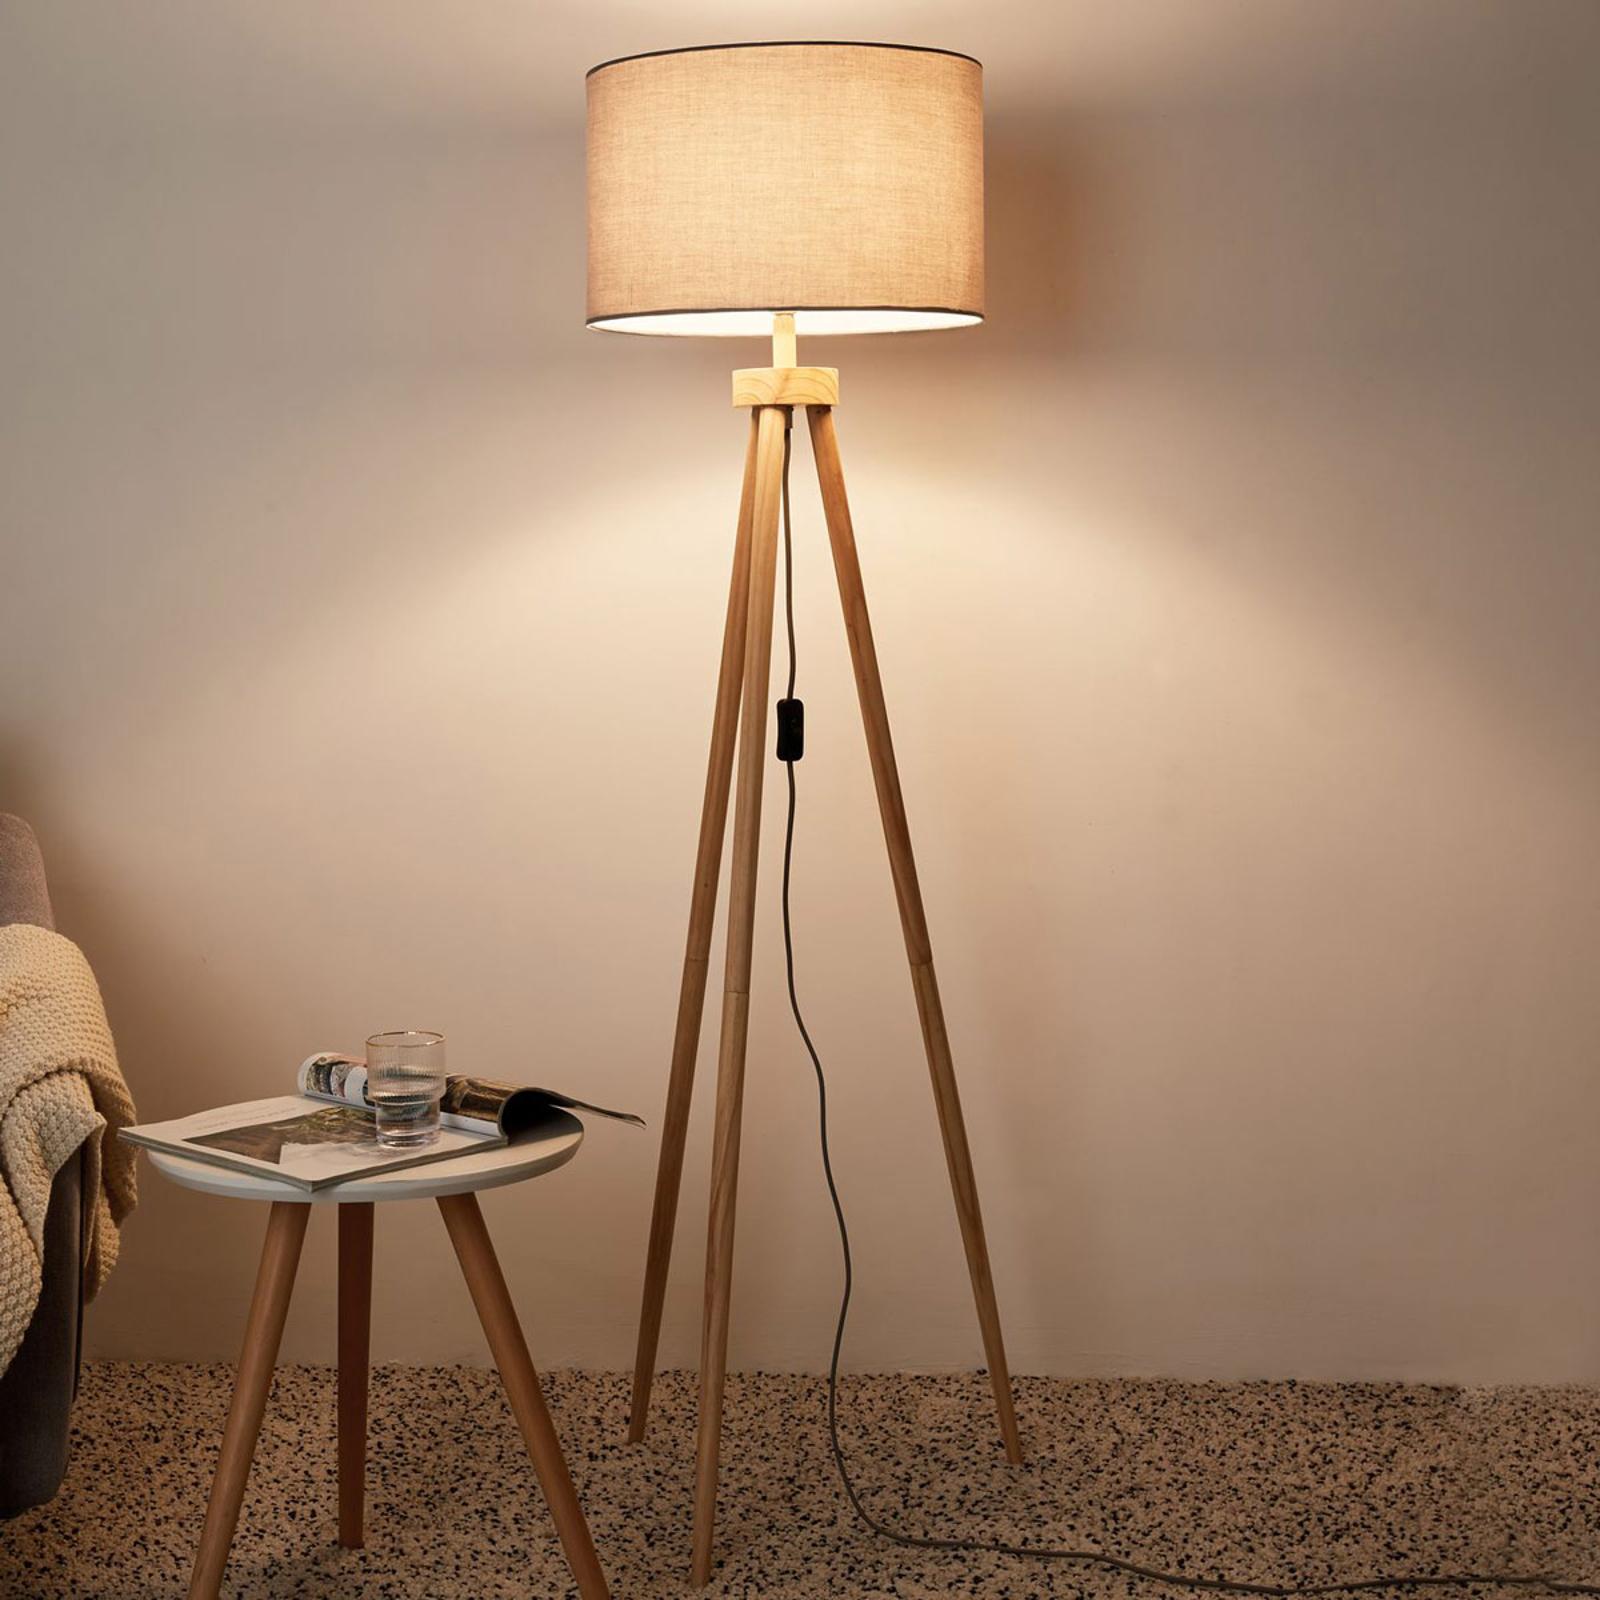 Pauleen Grand Coziness Stehlampe mit Holzgestell